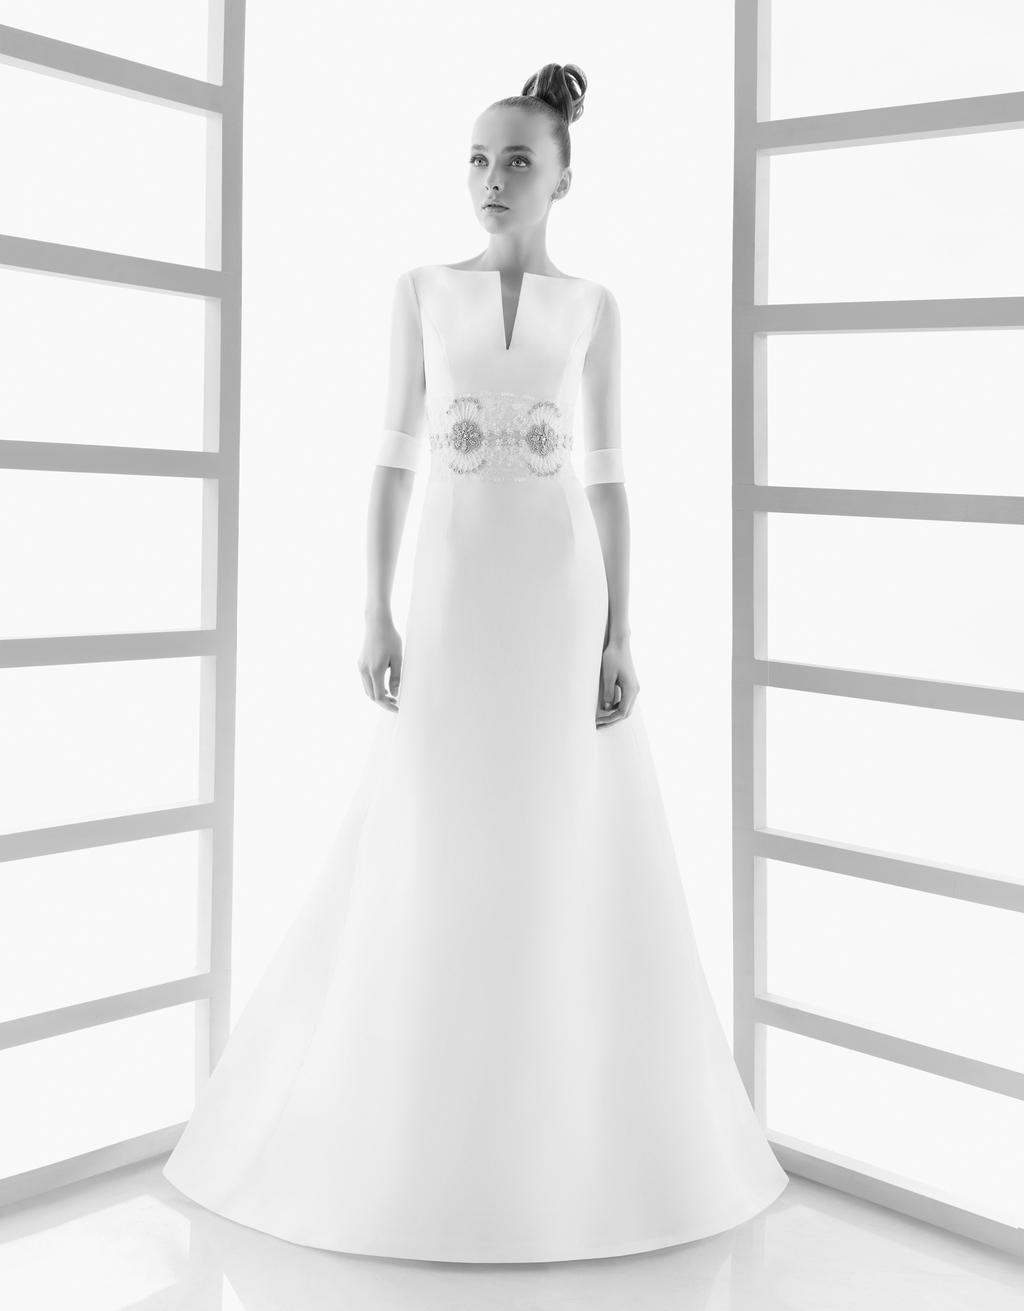 113-ef_mero-2011-wedding-dress-rosa-clara-three-quarter-sleeves-high-neck.full